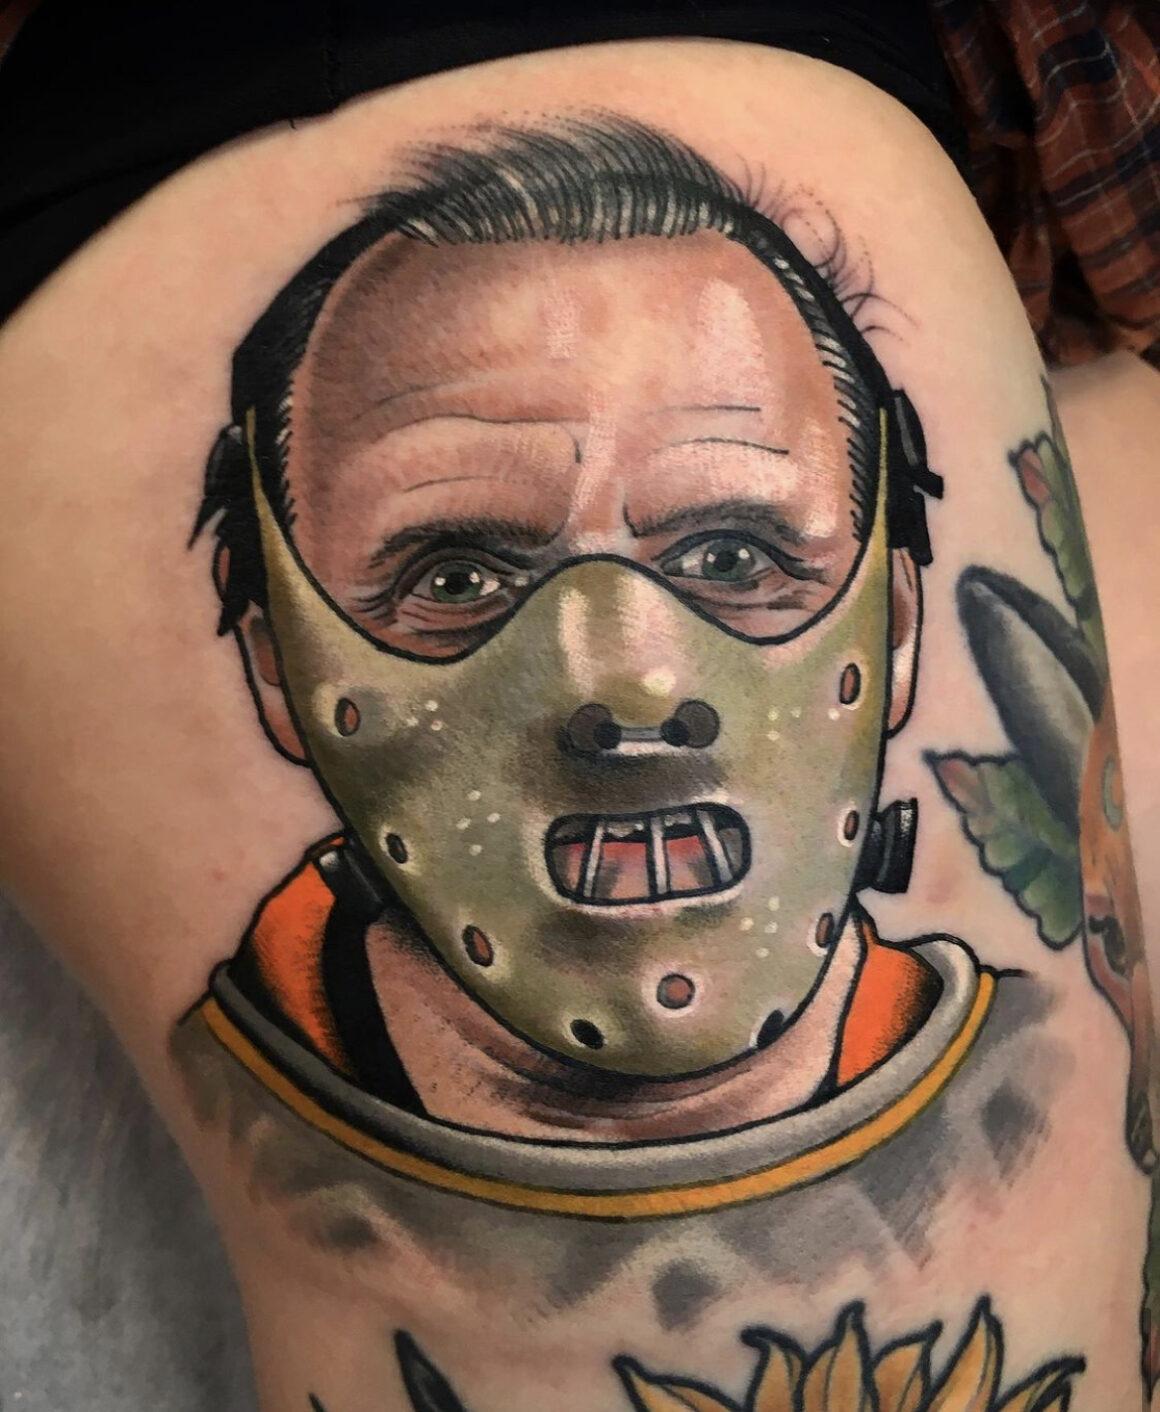 Josh Todaro, The Grand Illusion Tattoo, Melbourne, Australia